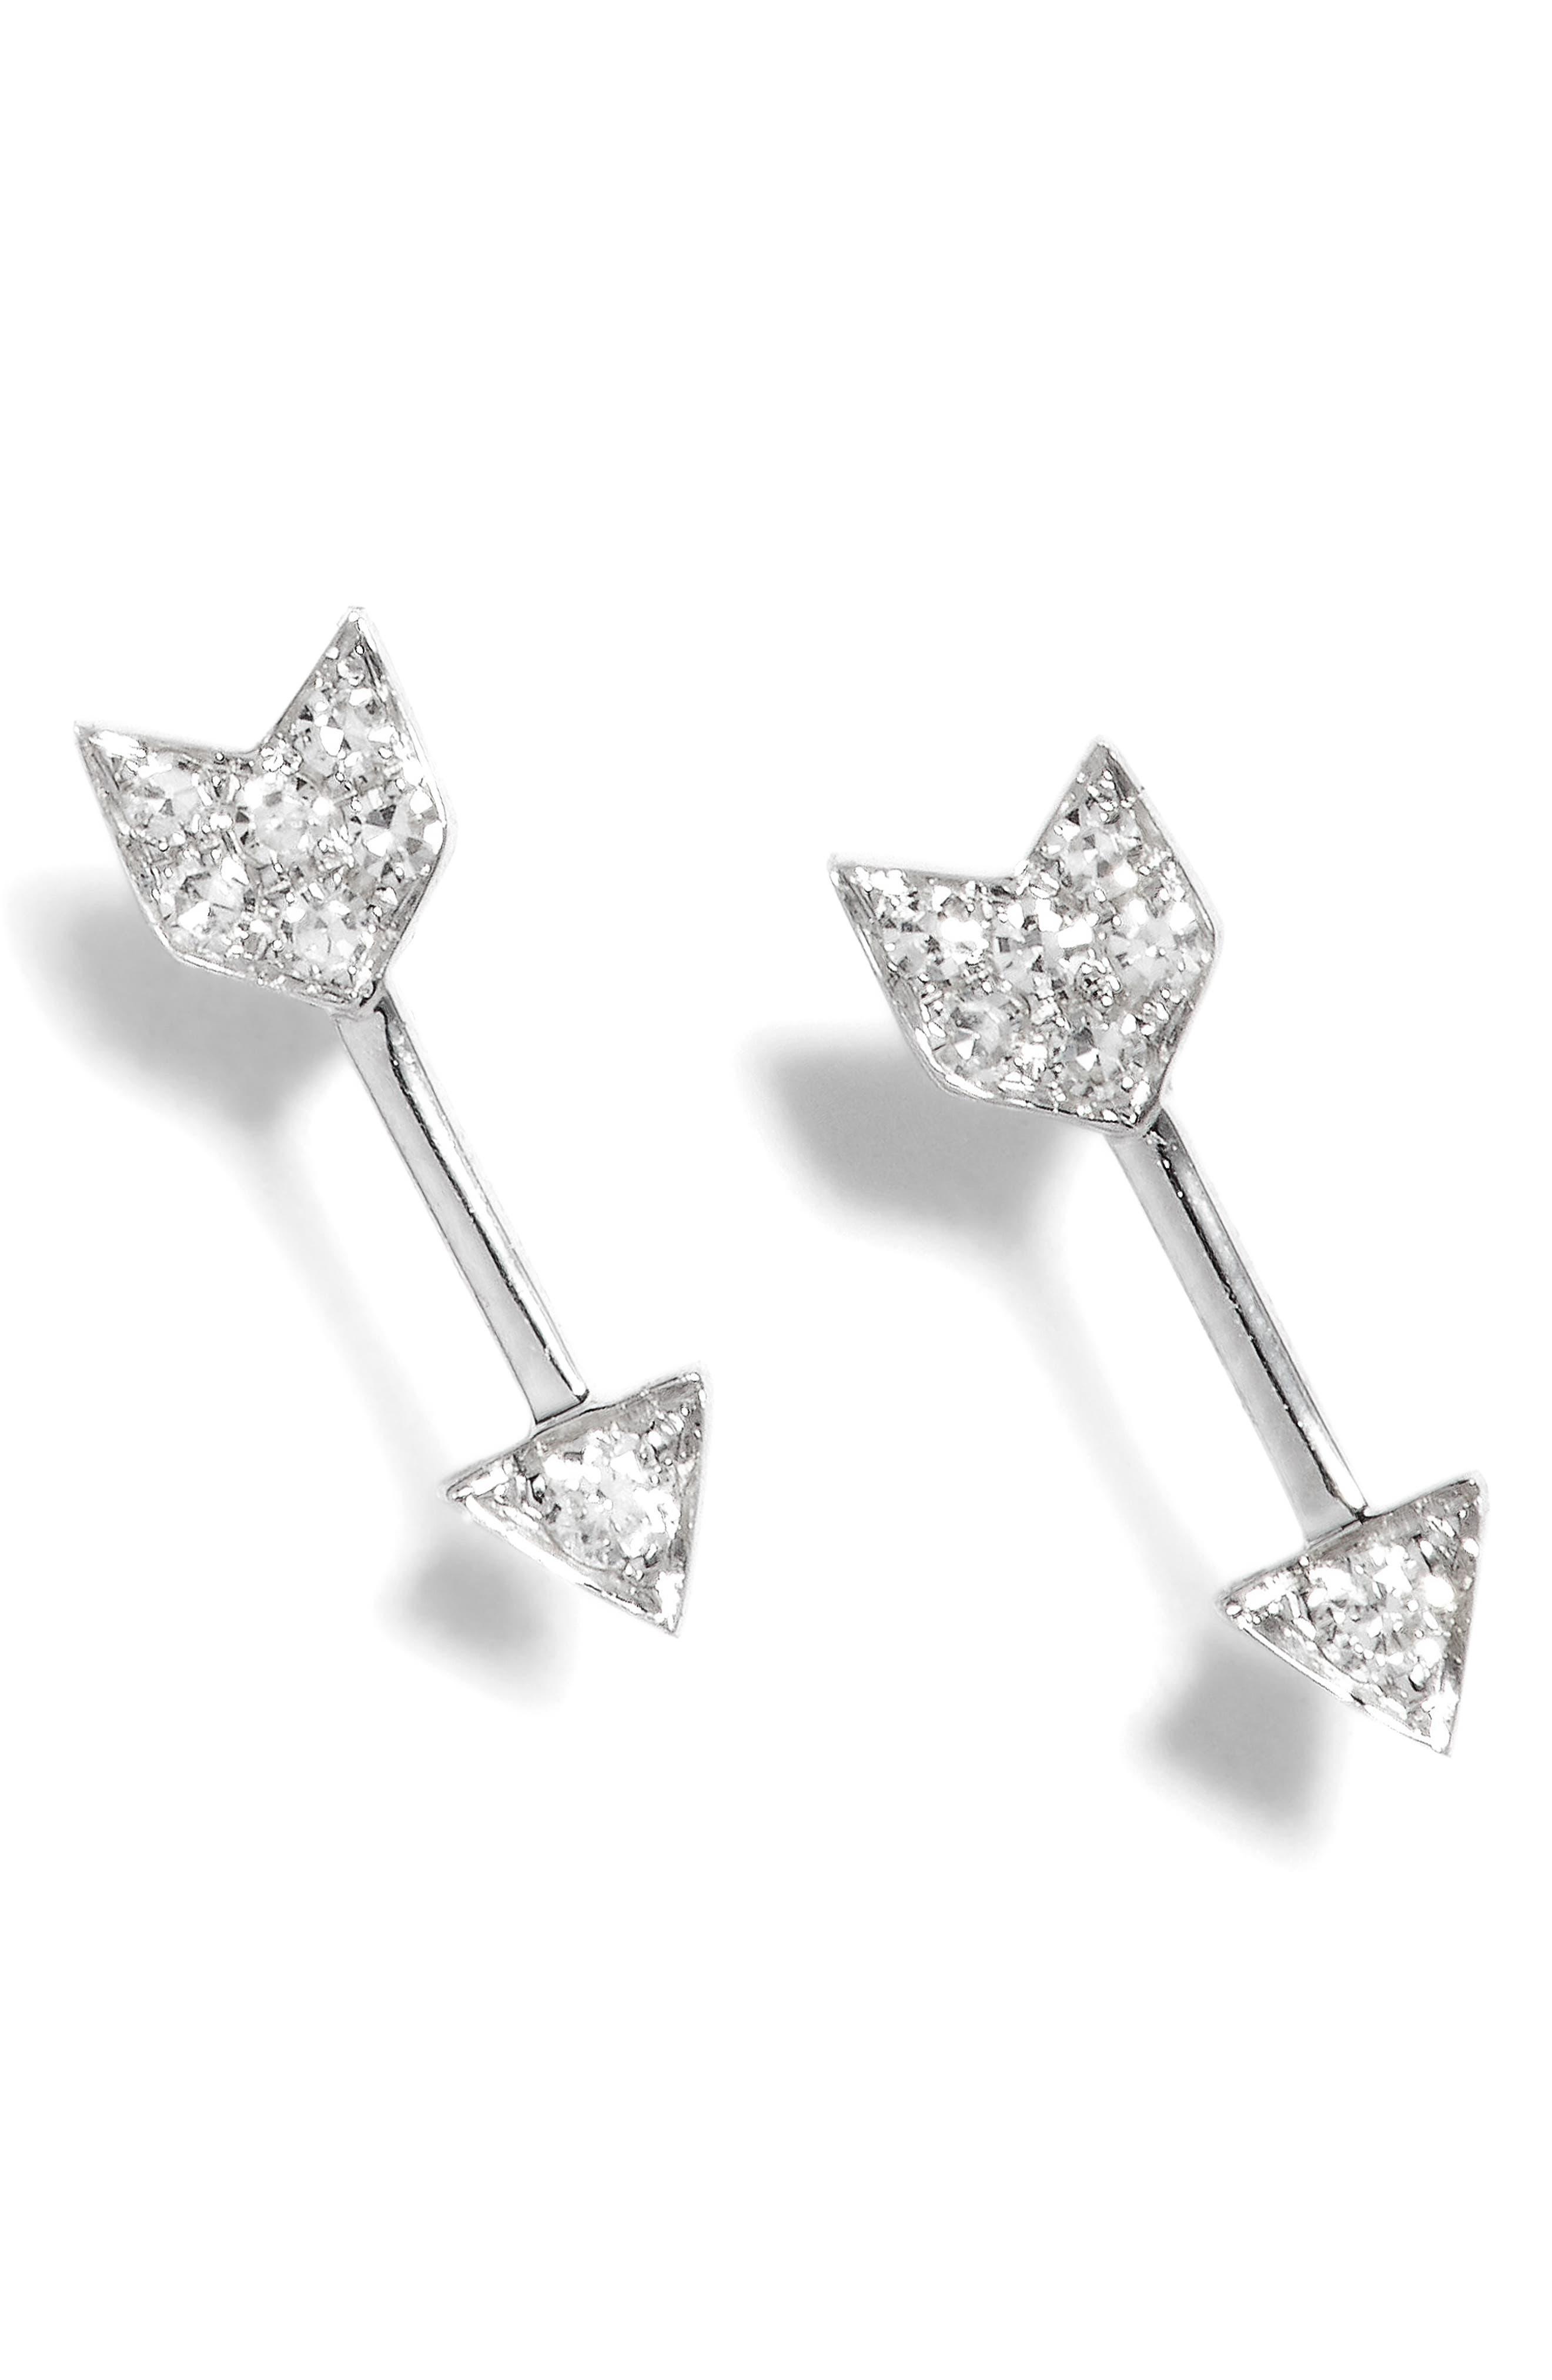 Diamond Arrow Stud Earrings,                             Main thumbnail 1, color,                             WHITE GOLD